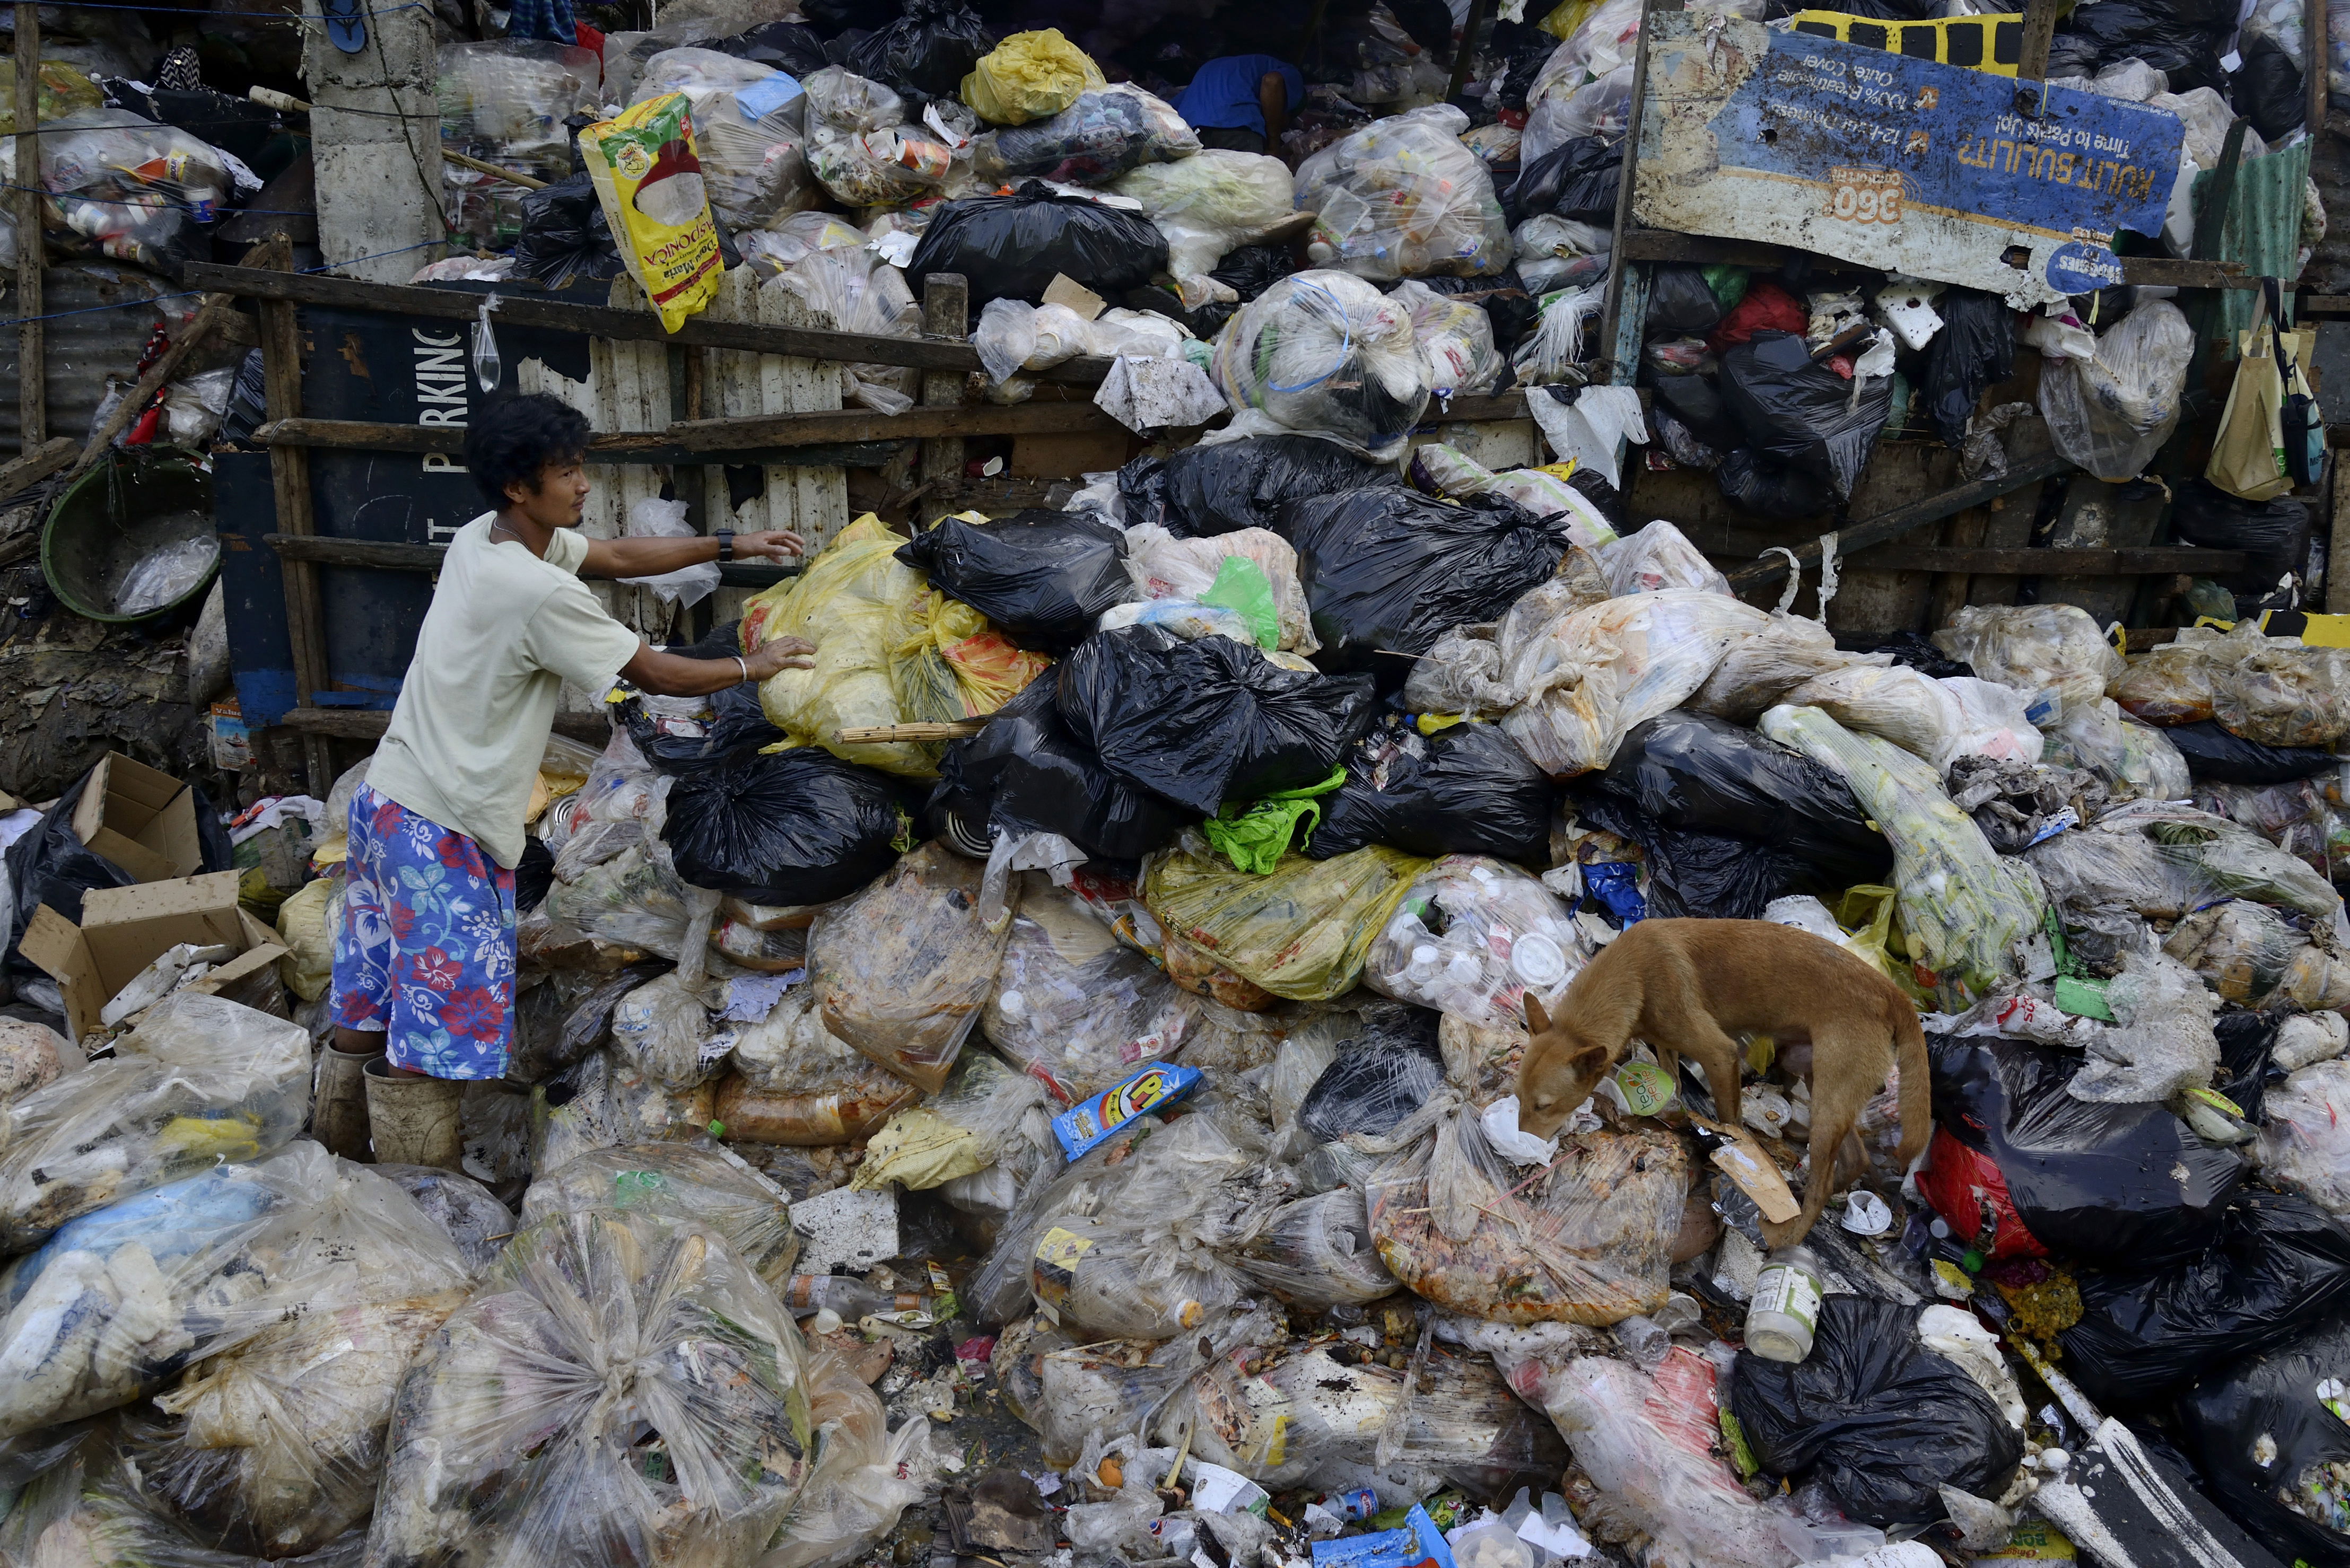 Filippinerna: 56 000 kubikmeter om dagen